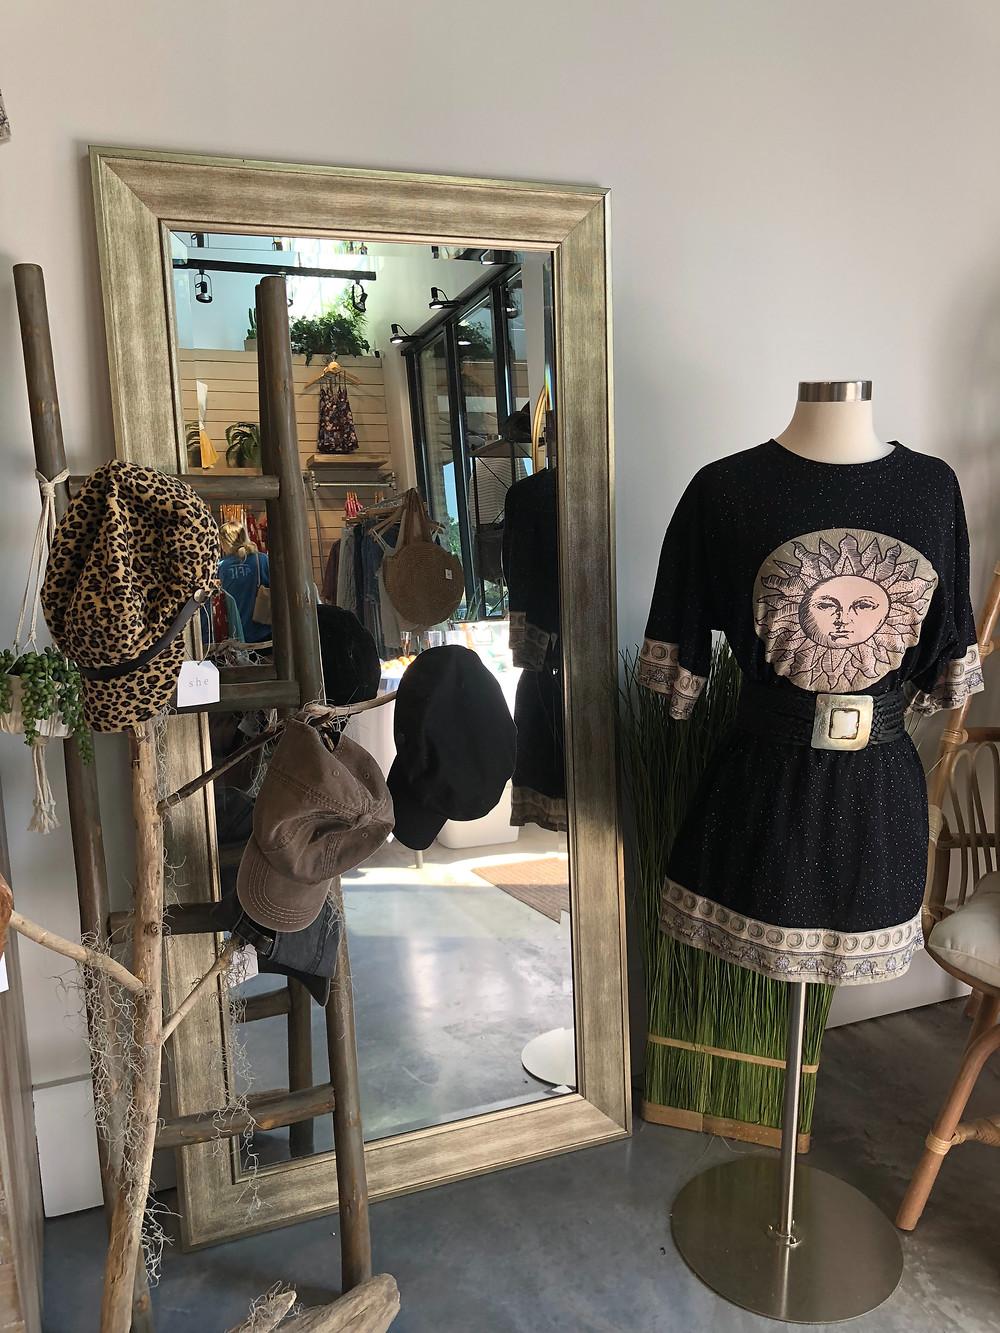 Celeste cotton t-shirt dress at SHE Metairie retail boutique